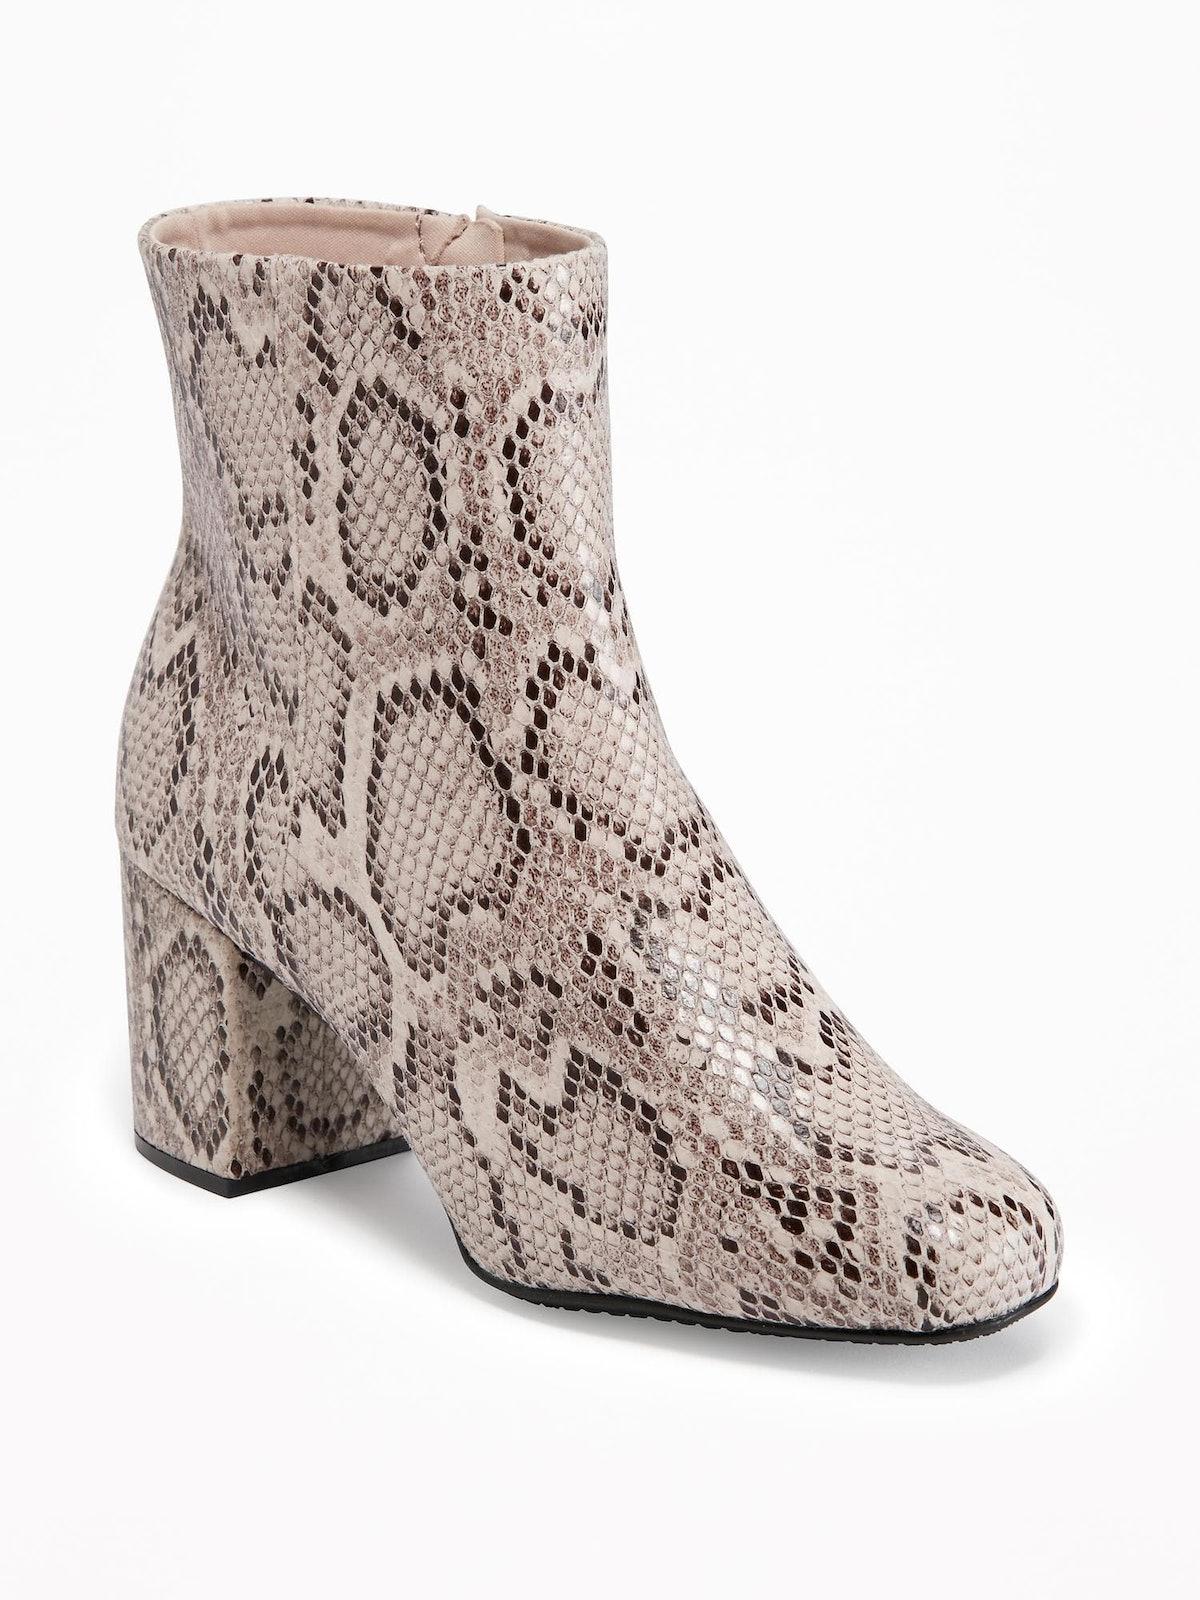 Snakeskin-Print Ankle Boots for Women